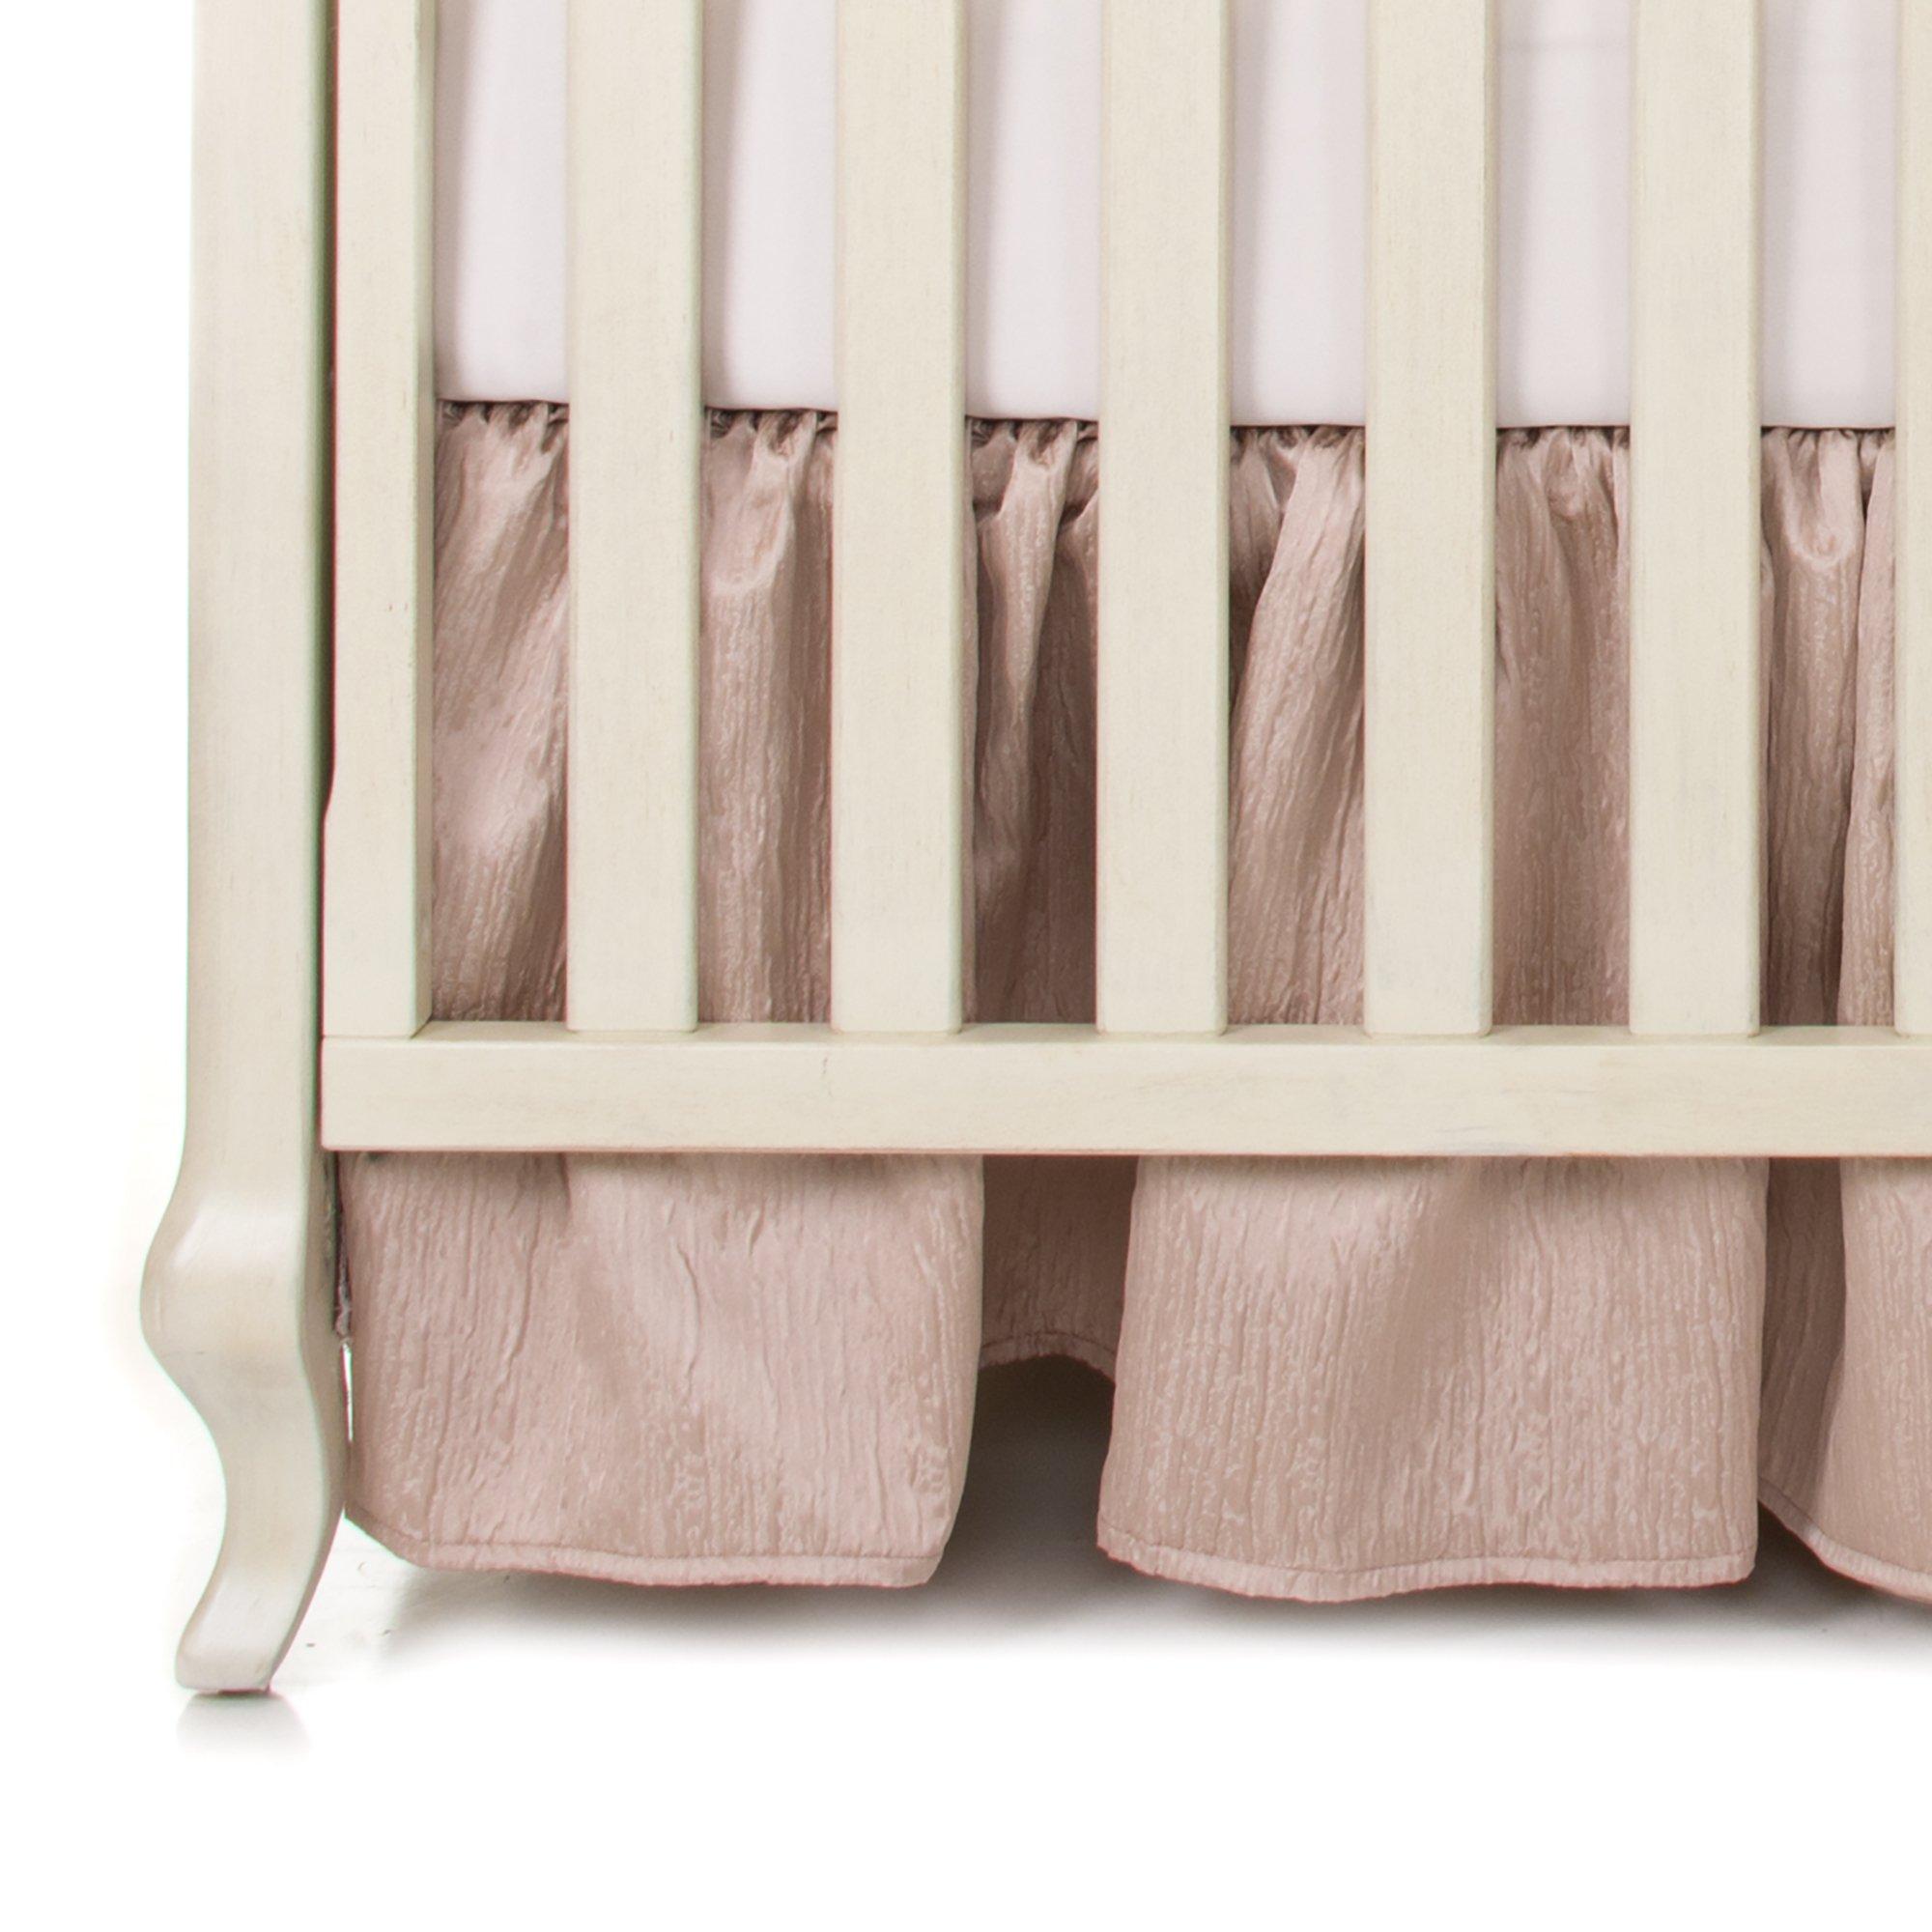 Glenna Jean Angelica Crib Skirt, Pink, one Size by Glenna Jean